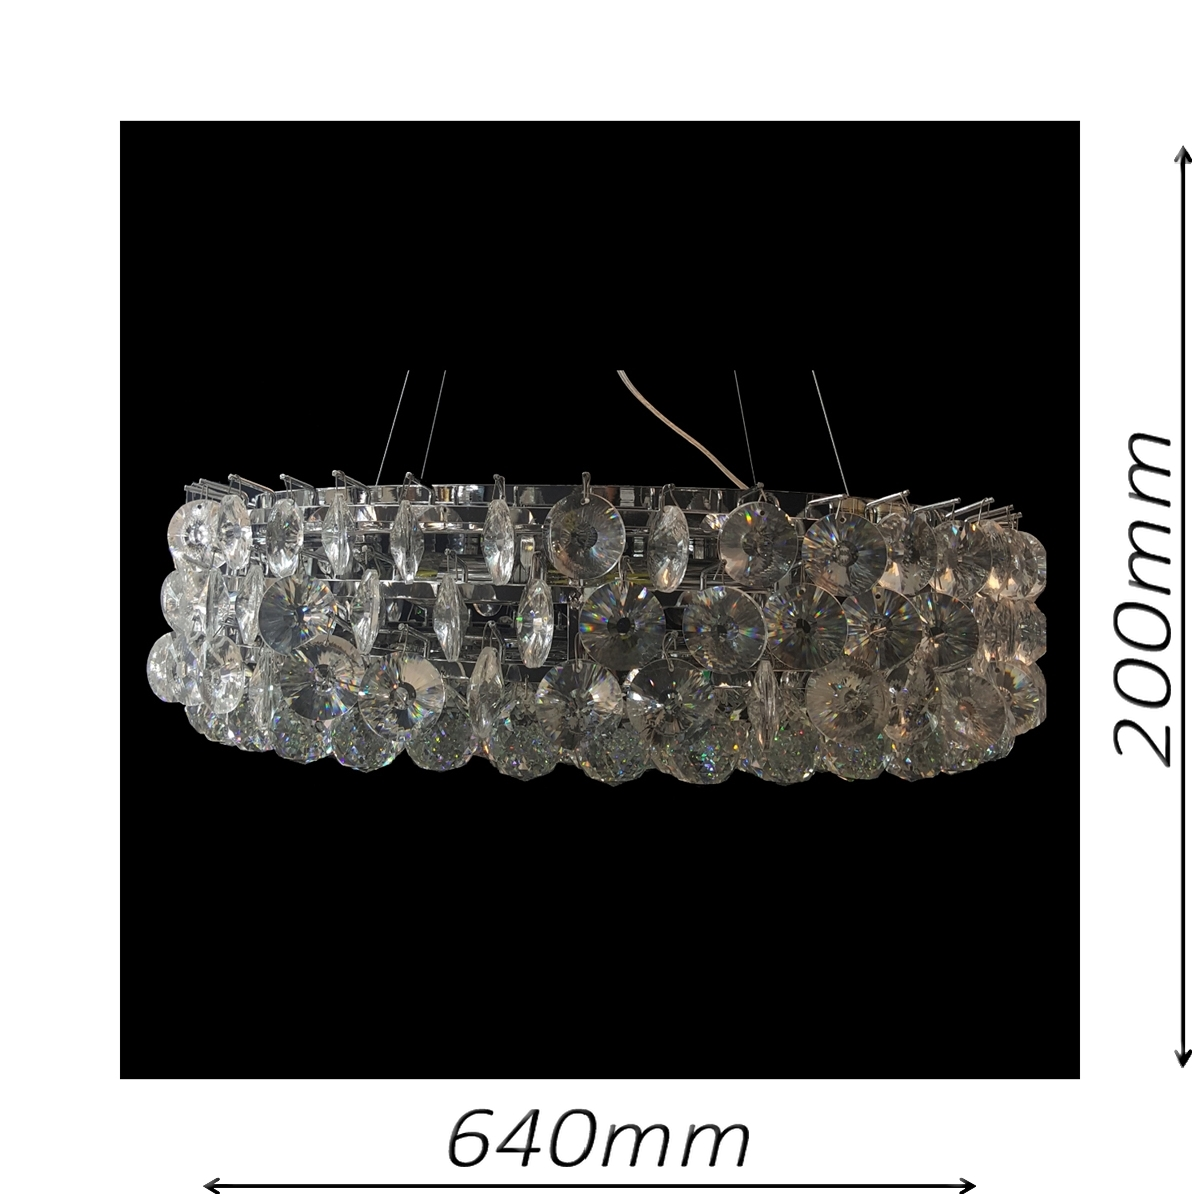 Musluk 610 Chrome Chandelier - CRPMUS10610CH